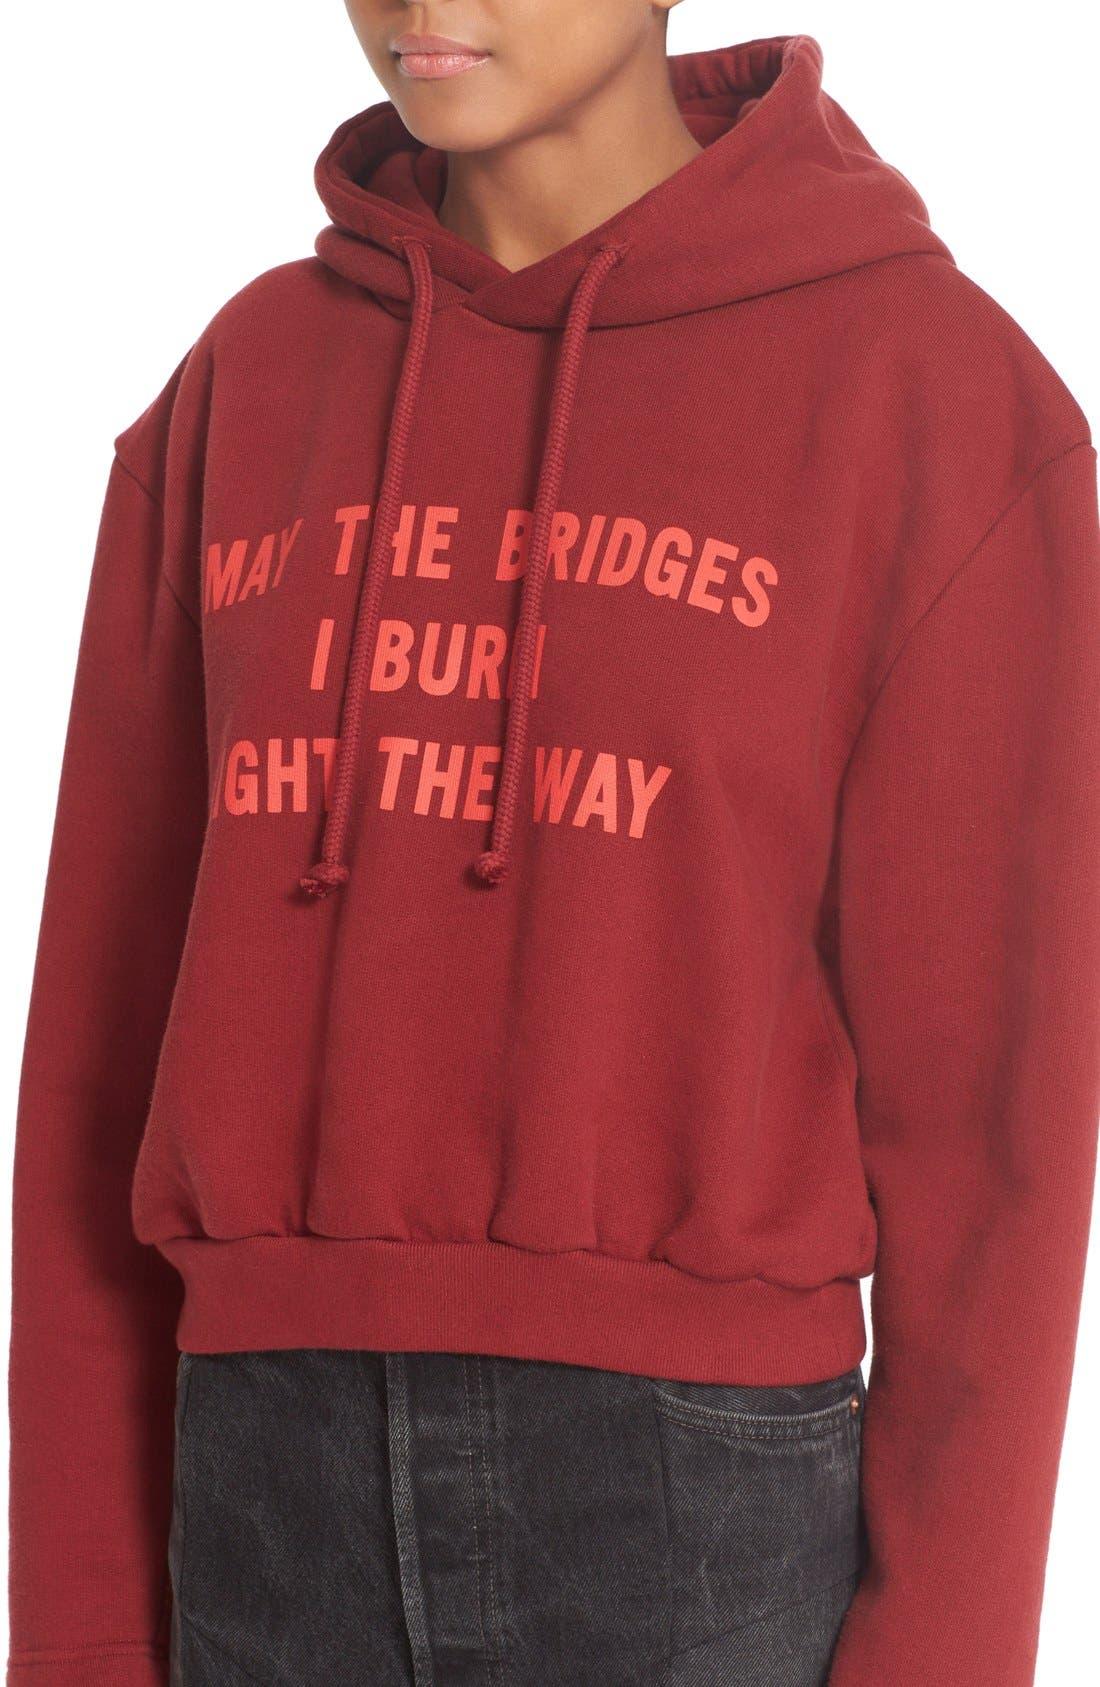 Alternate Image 7  - Vetements May the Bridges I Burn Light the Way Football Shoulder Hoodie